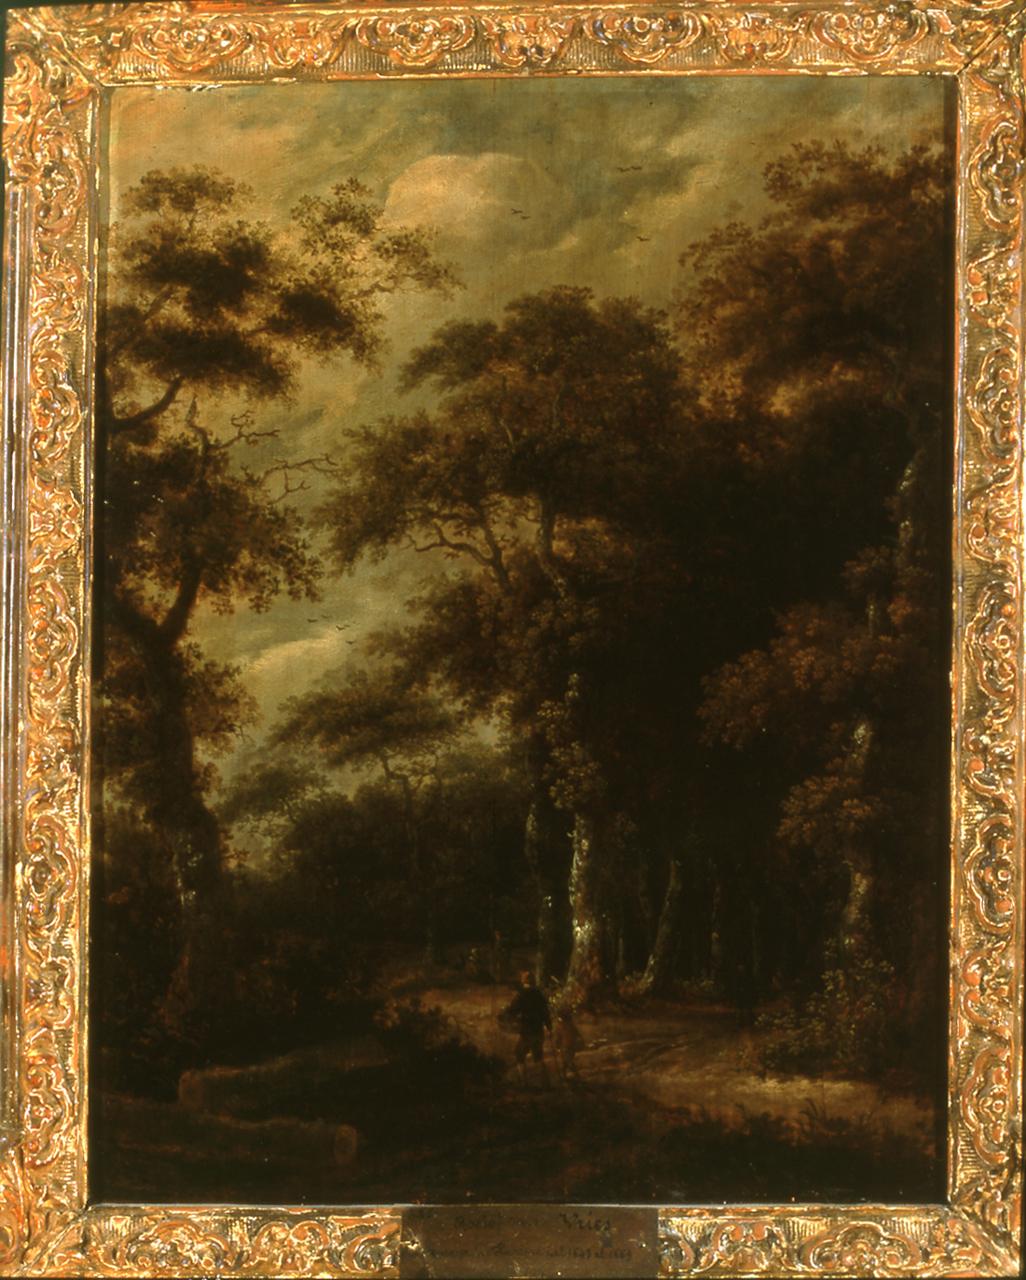 paesaggio con figure (dipinto, opera isolata) di van Vries Roelof Jansz - ambito olandese (sec. XVII, terzo quarto)